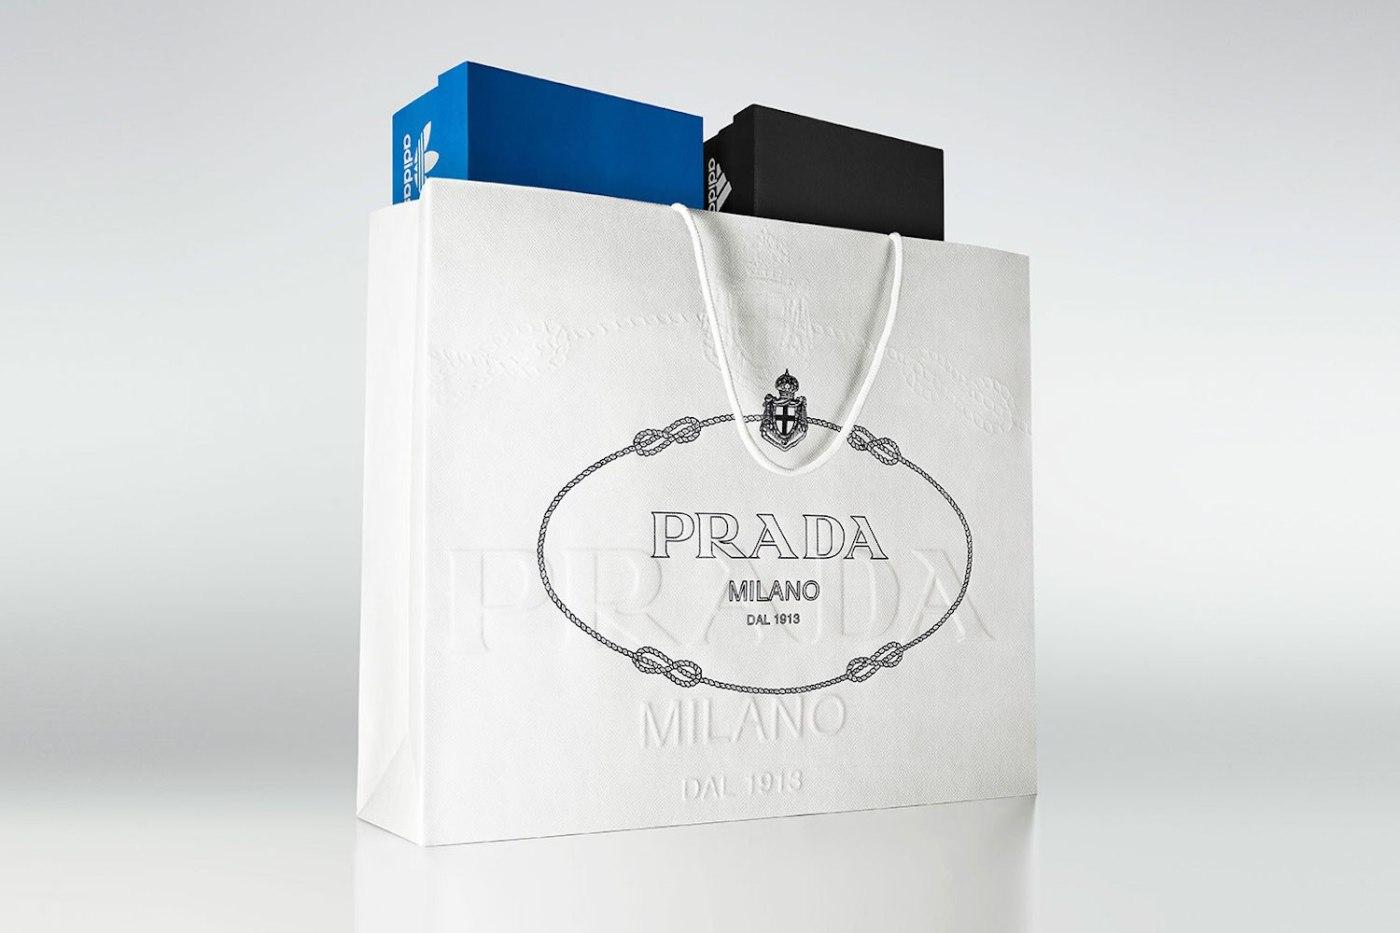 adidas,Prada  Prada x adidas 官宣了!国内官网开启神秘预告页面